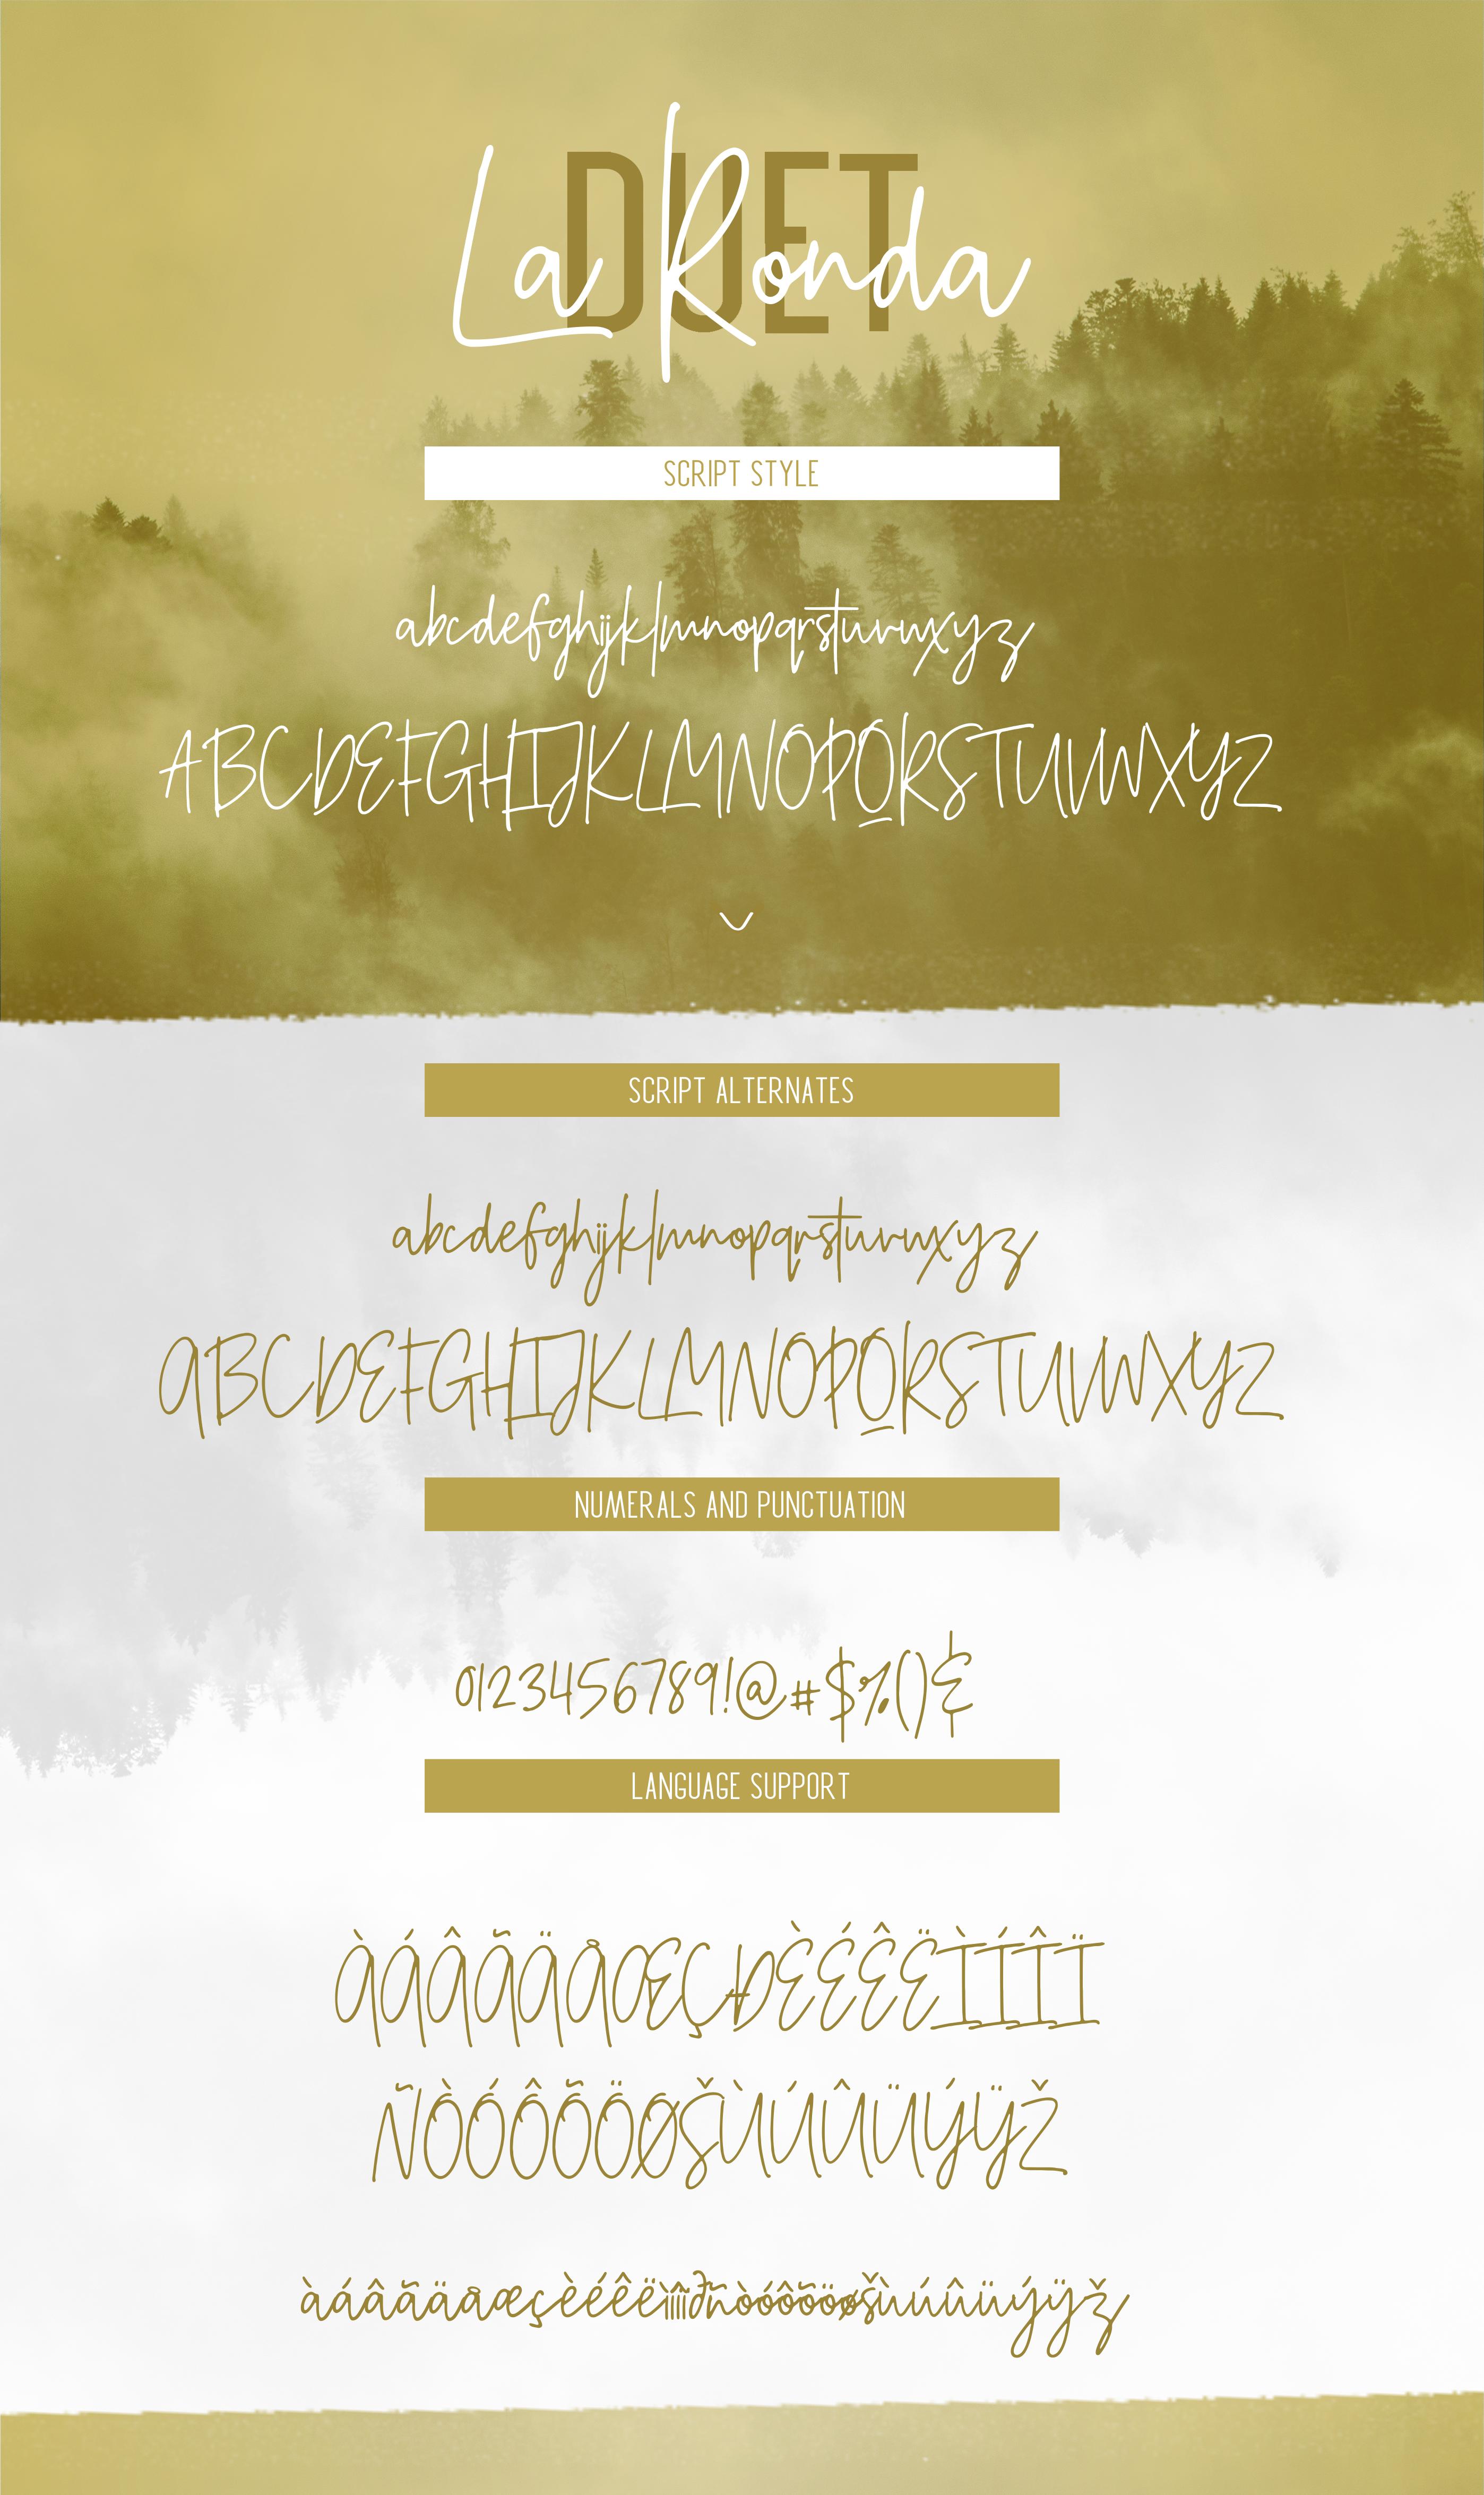 La Ronda Signature Font example image 11